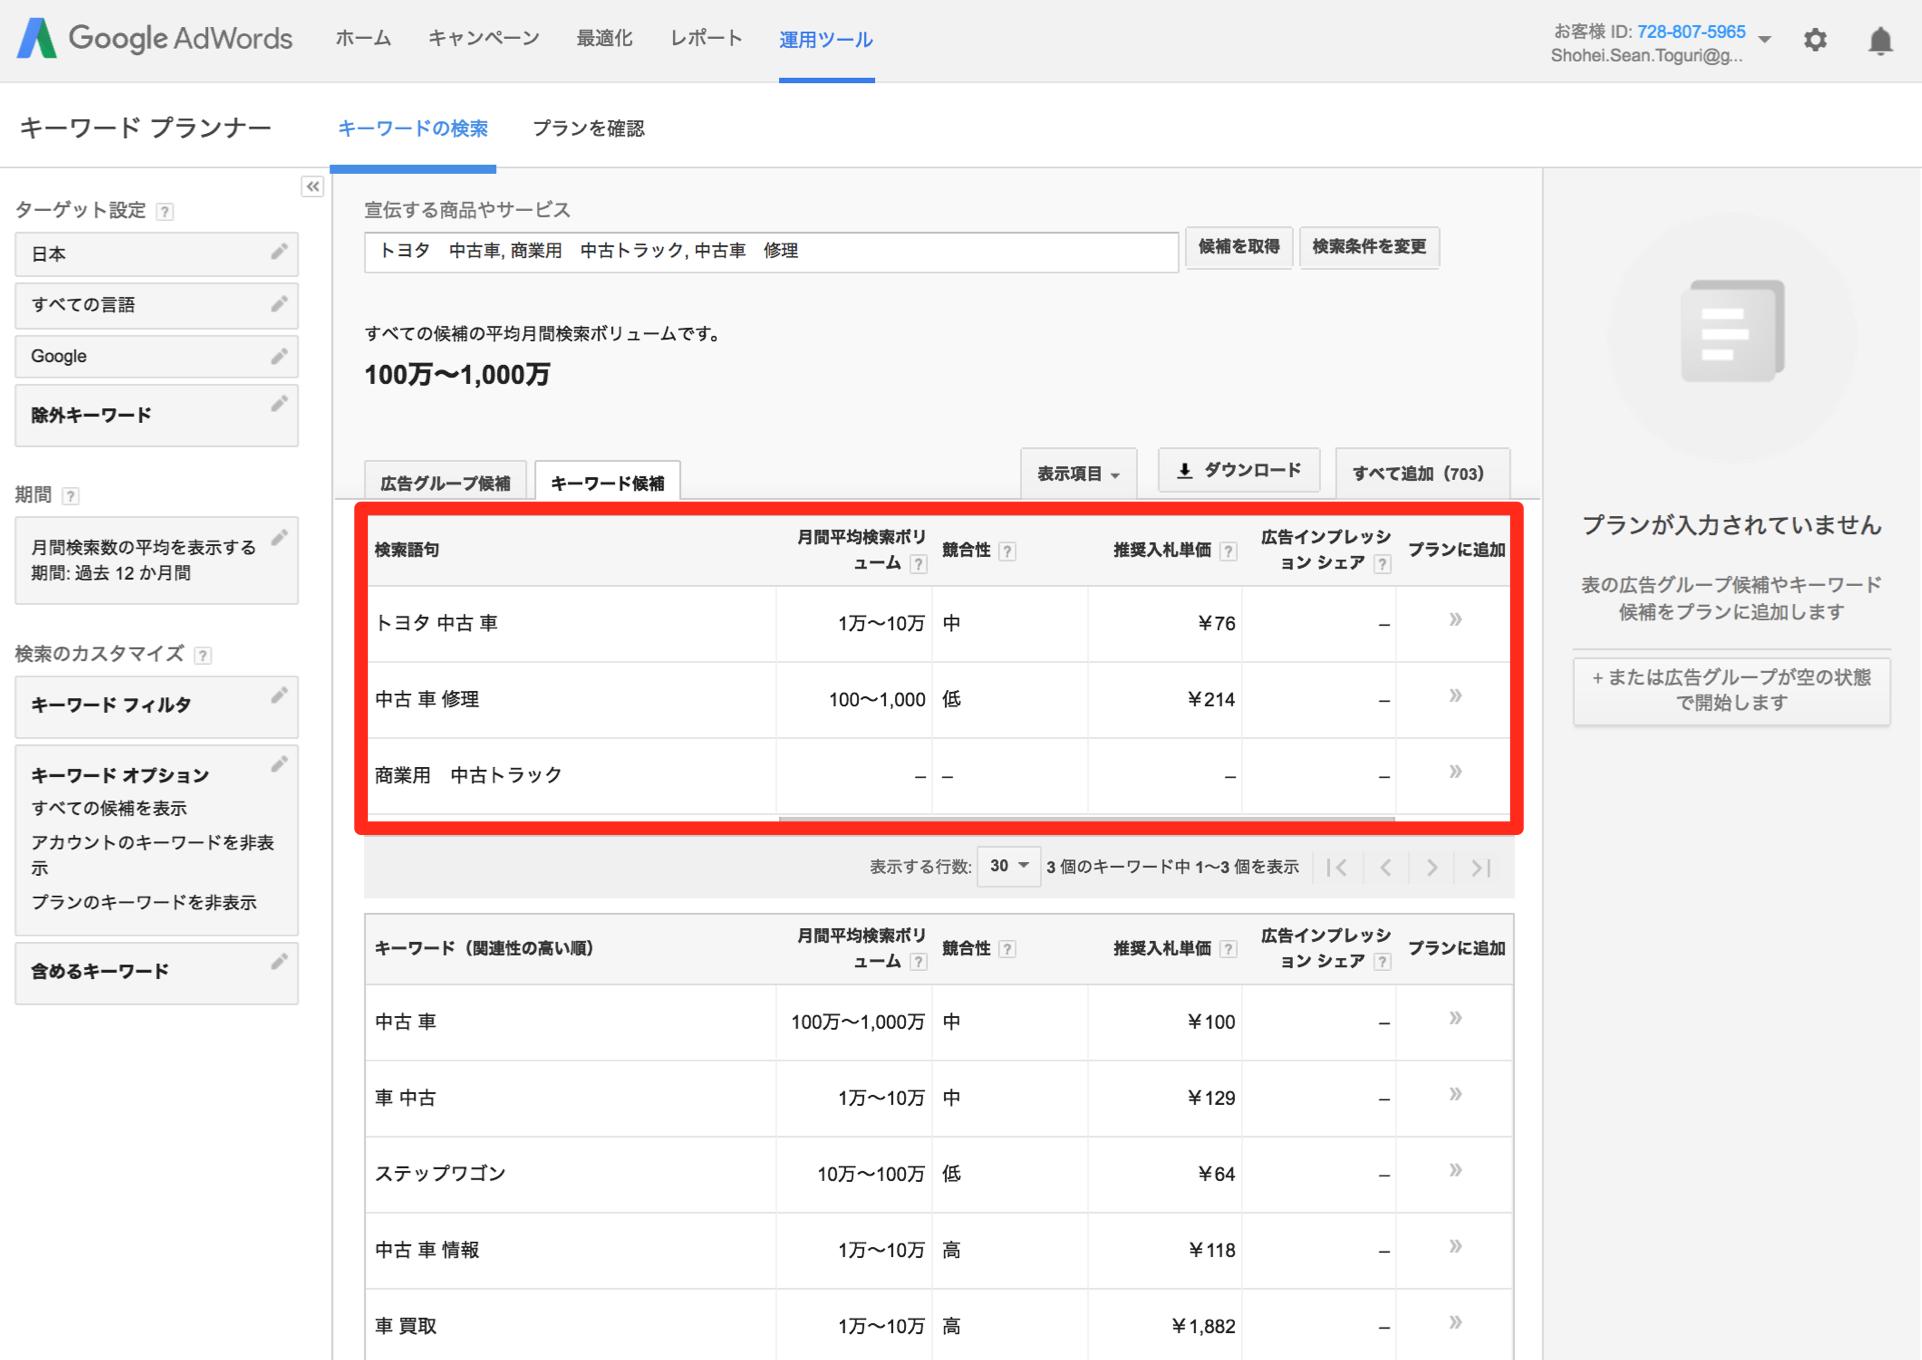 Google AdWordsの使い方:誰でもできるアドワーズの設定方法を解説